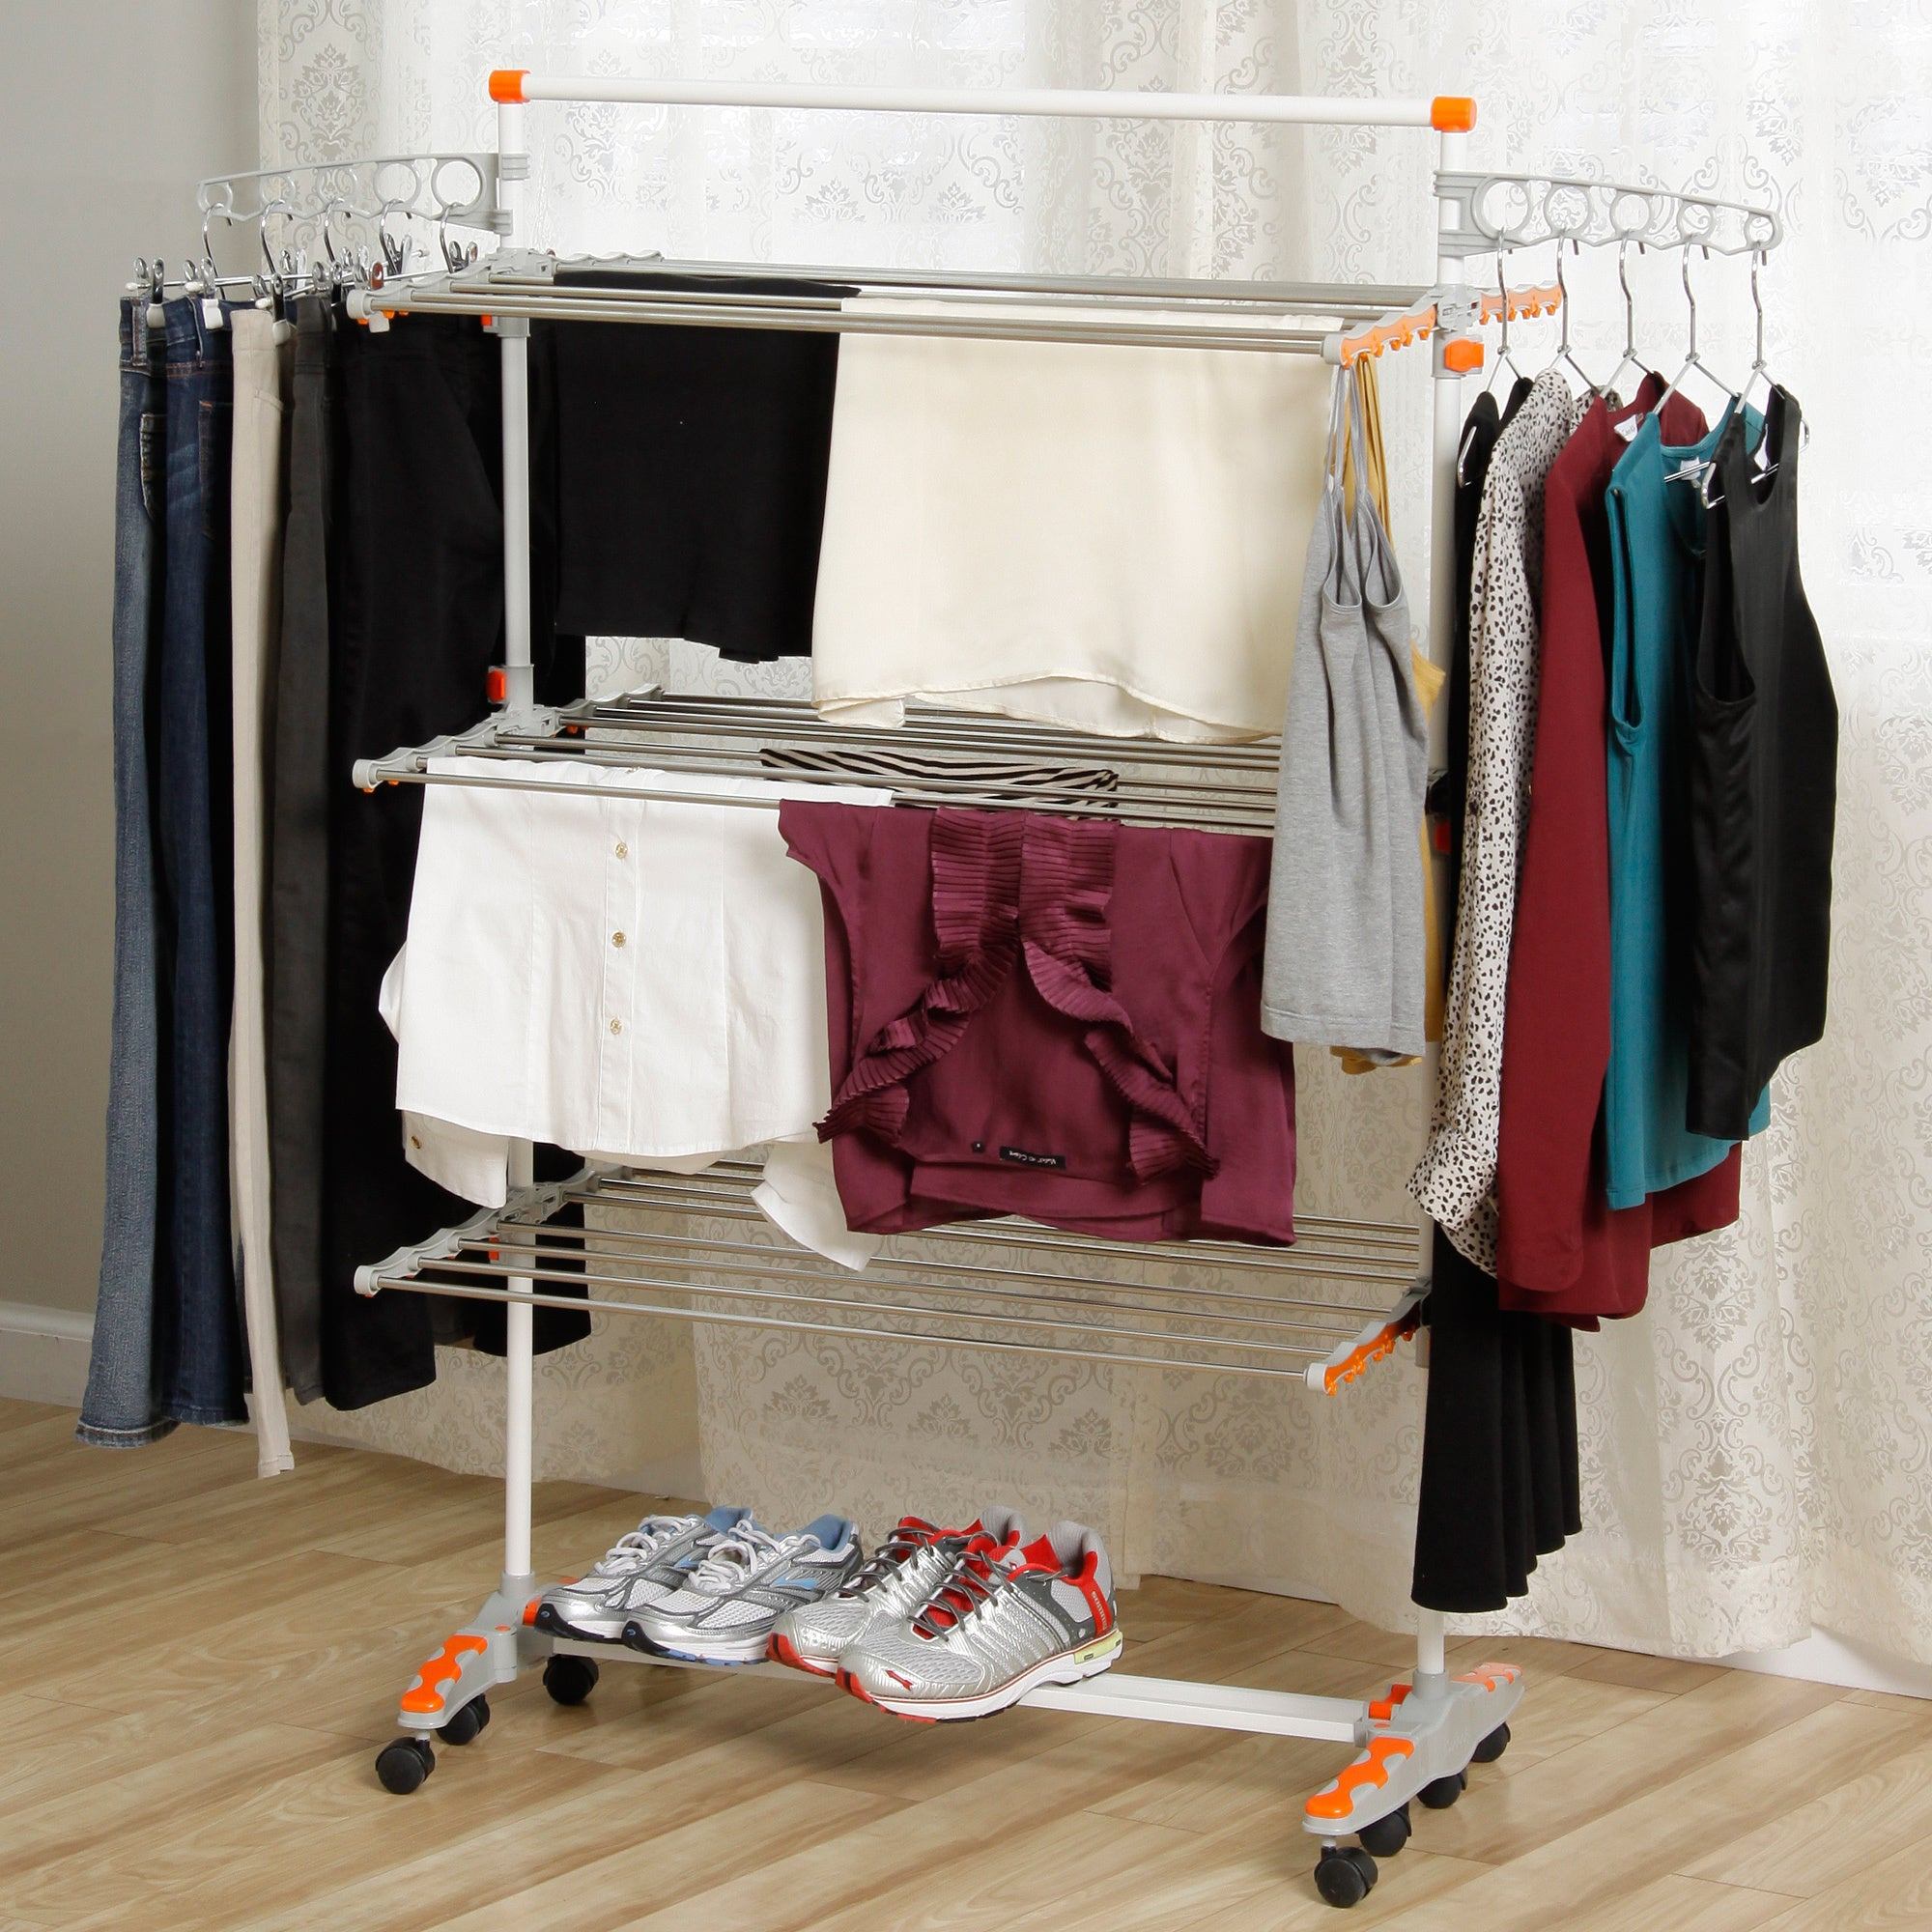 Badoogi Foldable Heavy Duty and Compact Storage Drying Ra...